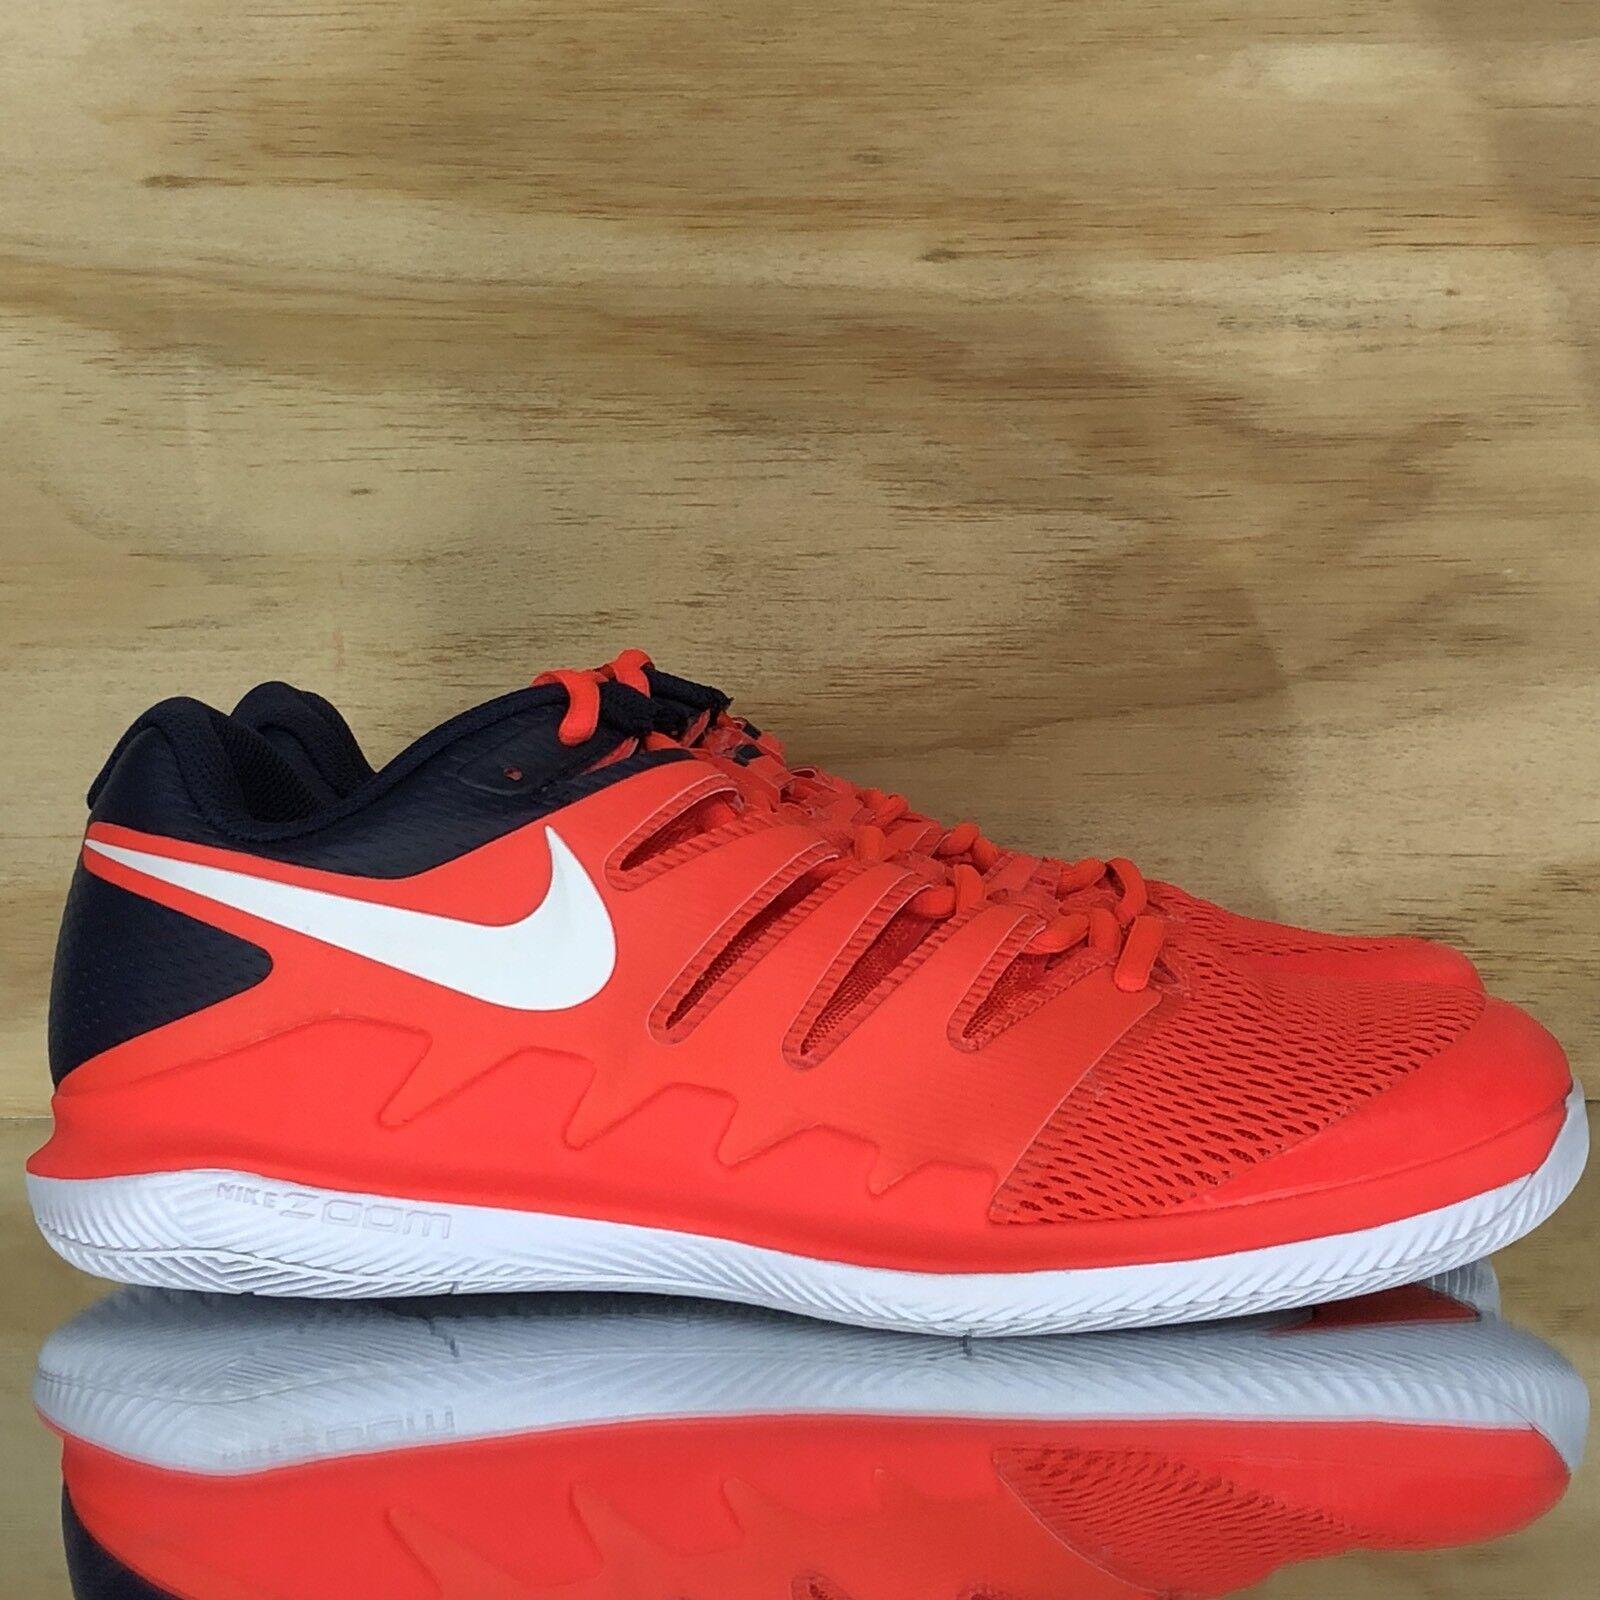 Nike Air Zoom Vapor X HC Crimson Navy White Tennis Shoes AA8030-600 Size 12.5